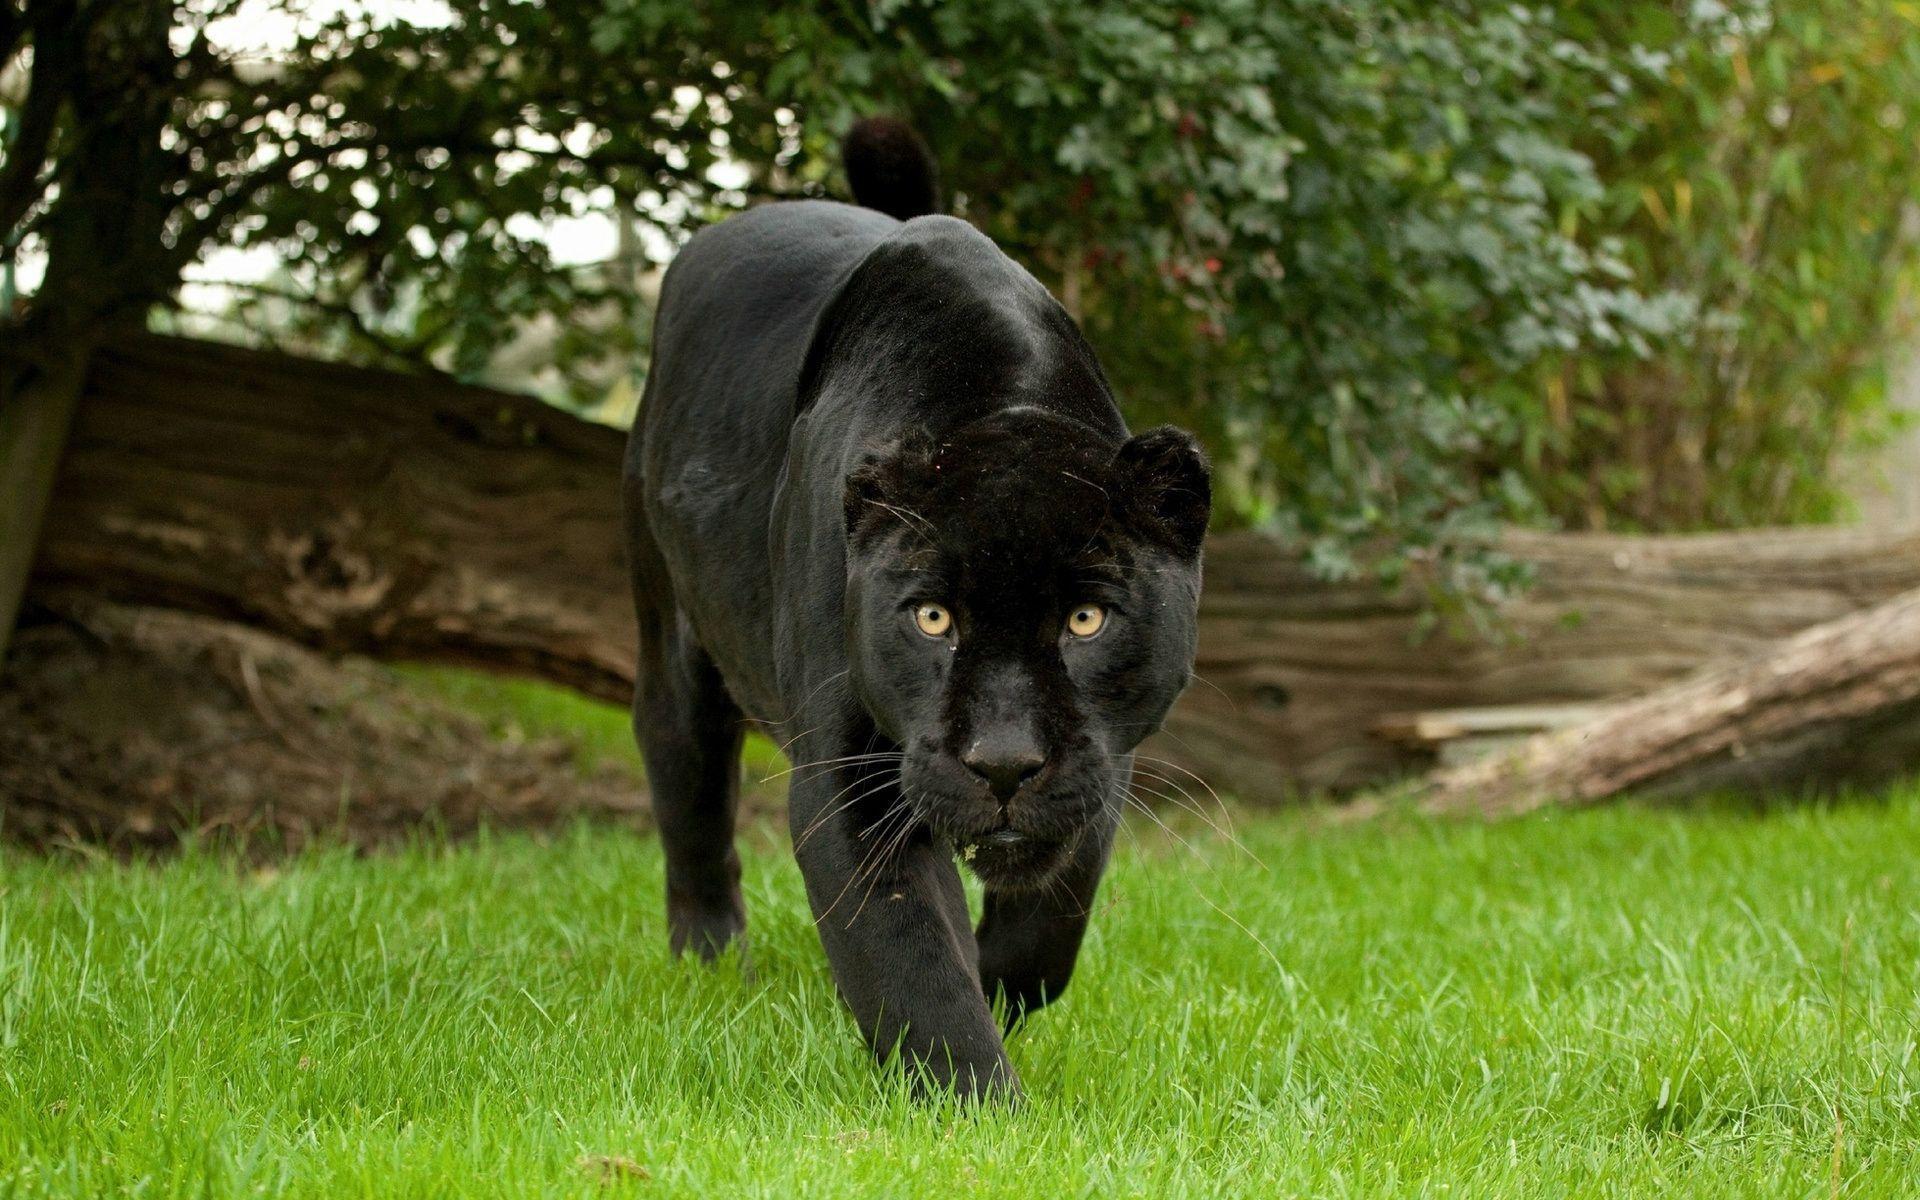 Black Panther Images Free